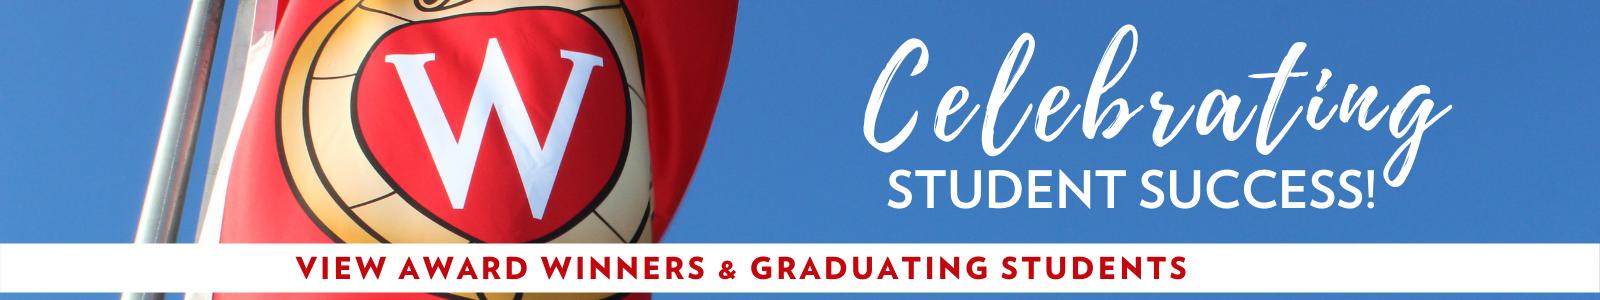 Celebrating Student Success VIEW AWARD WINNERS & GRADUATING STUDENTS